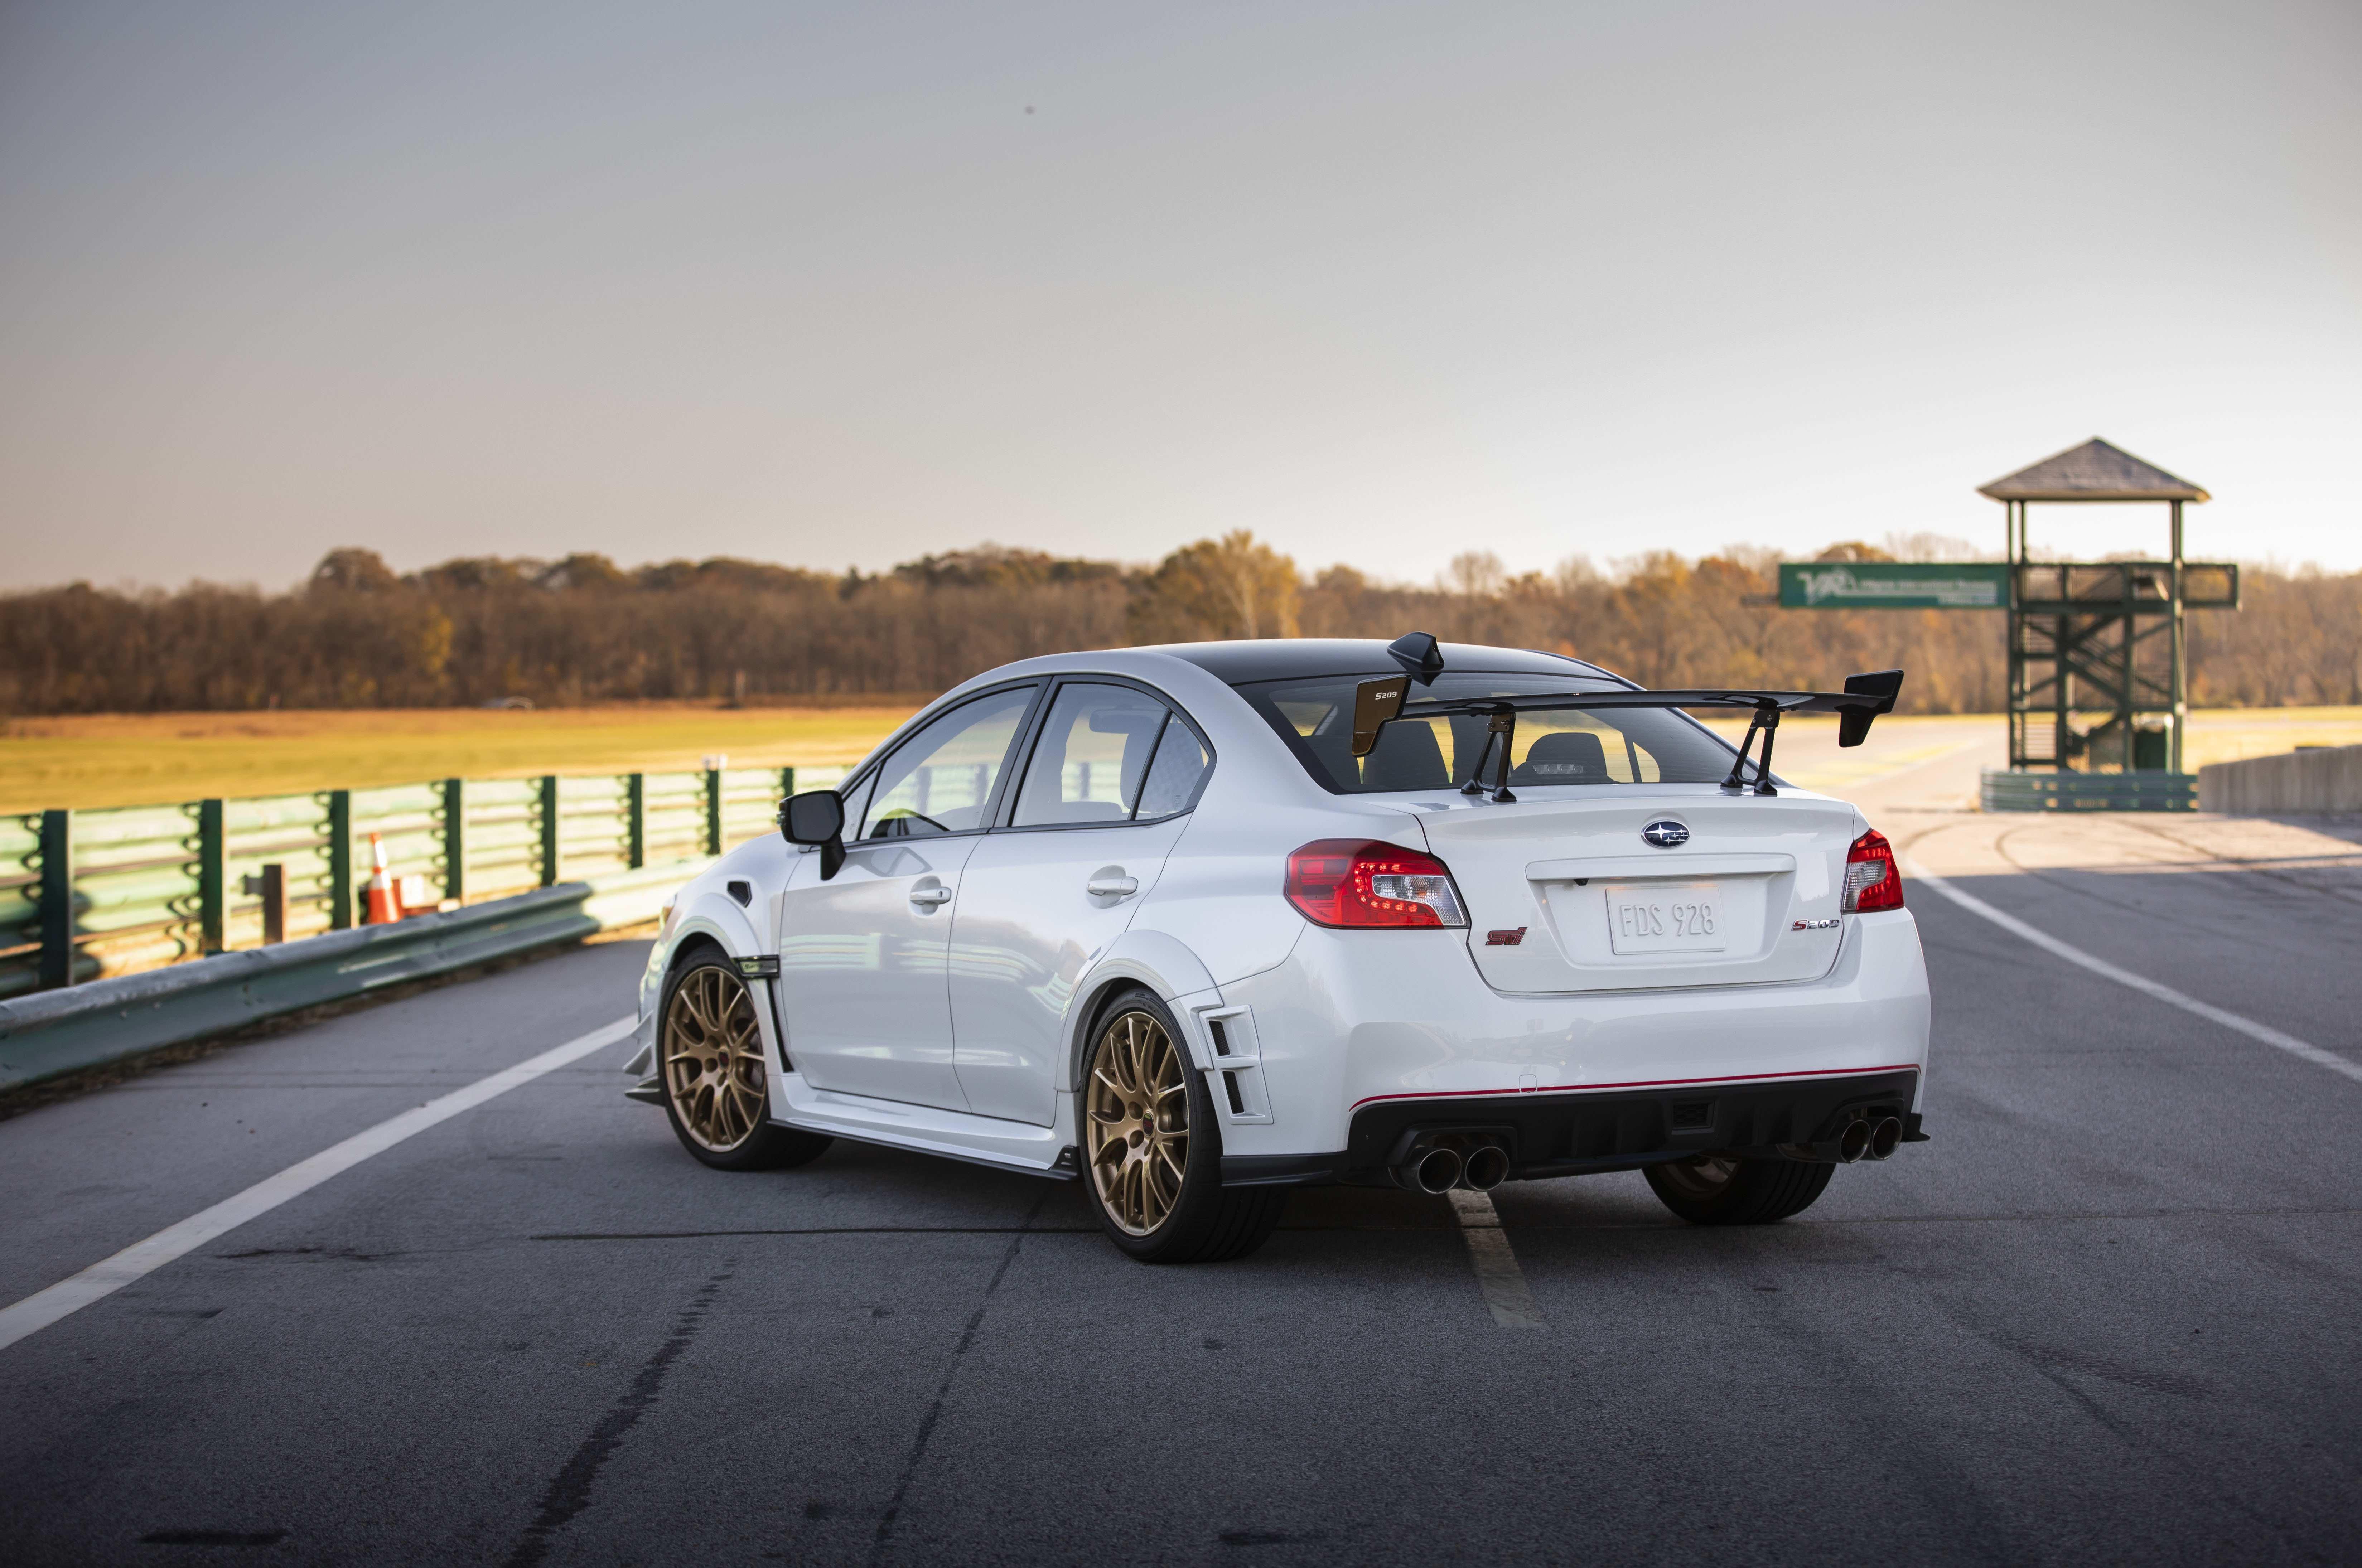 40 Concept of 2020 Subaru Wrx Sti Specs Release Date with 2020 Subaru Wrx Sti Specs